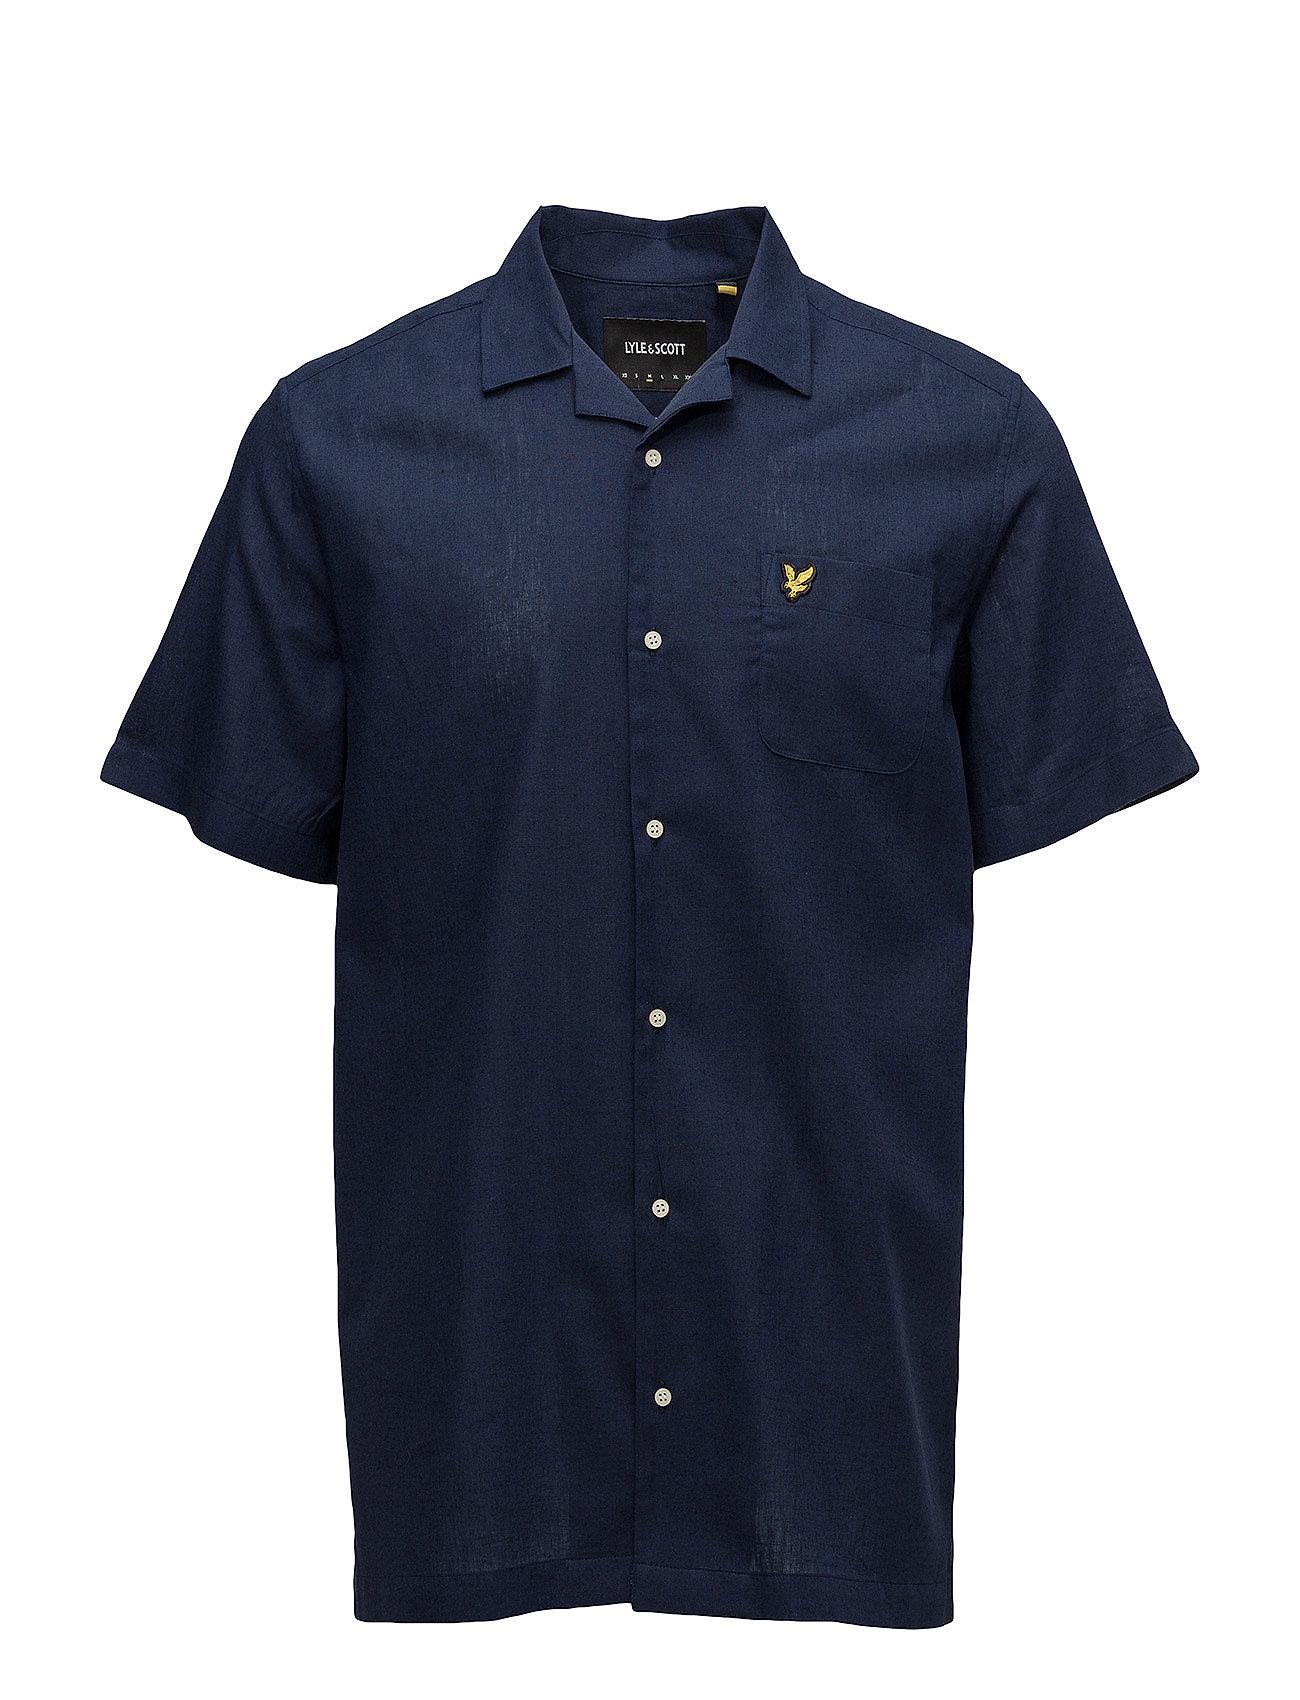 Lyle & Scott Resort Shirt - NAVY